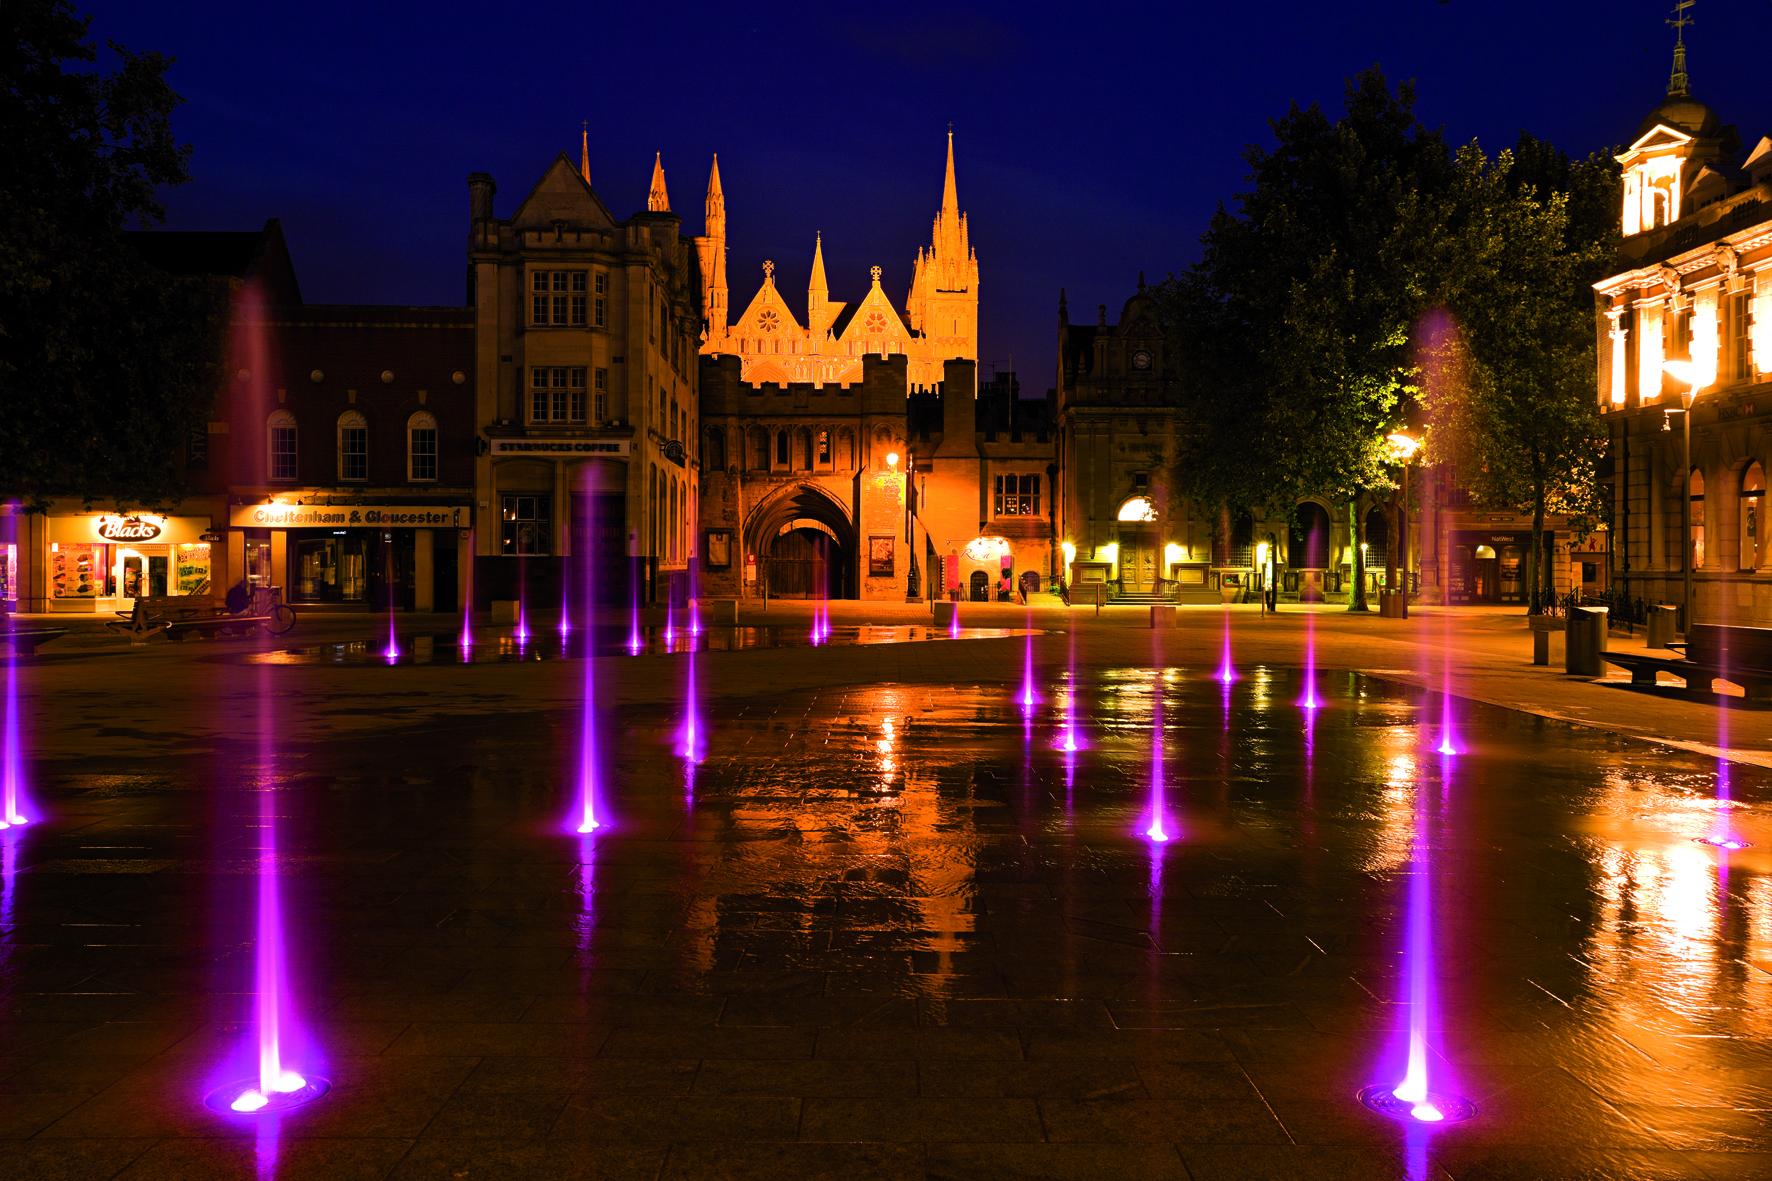 Cathedral Square, Petersborough